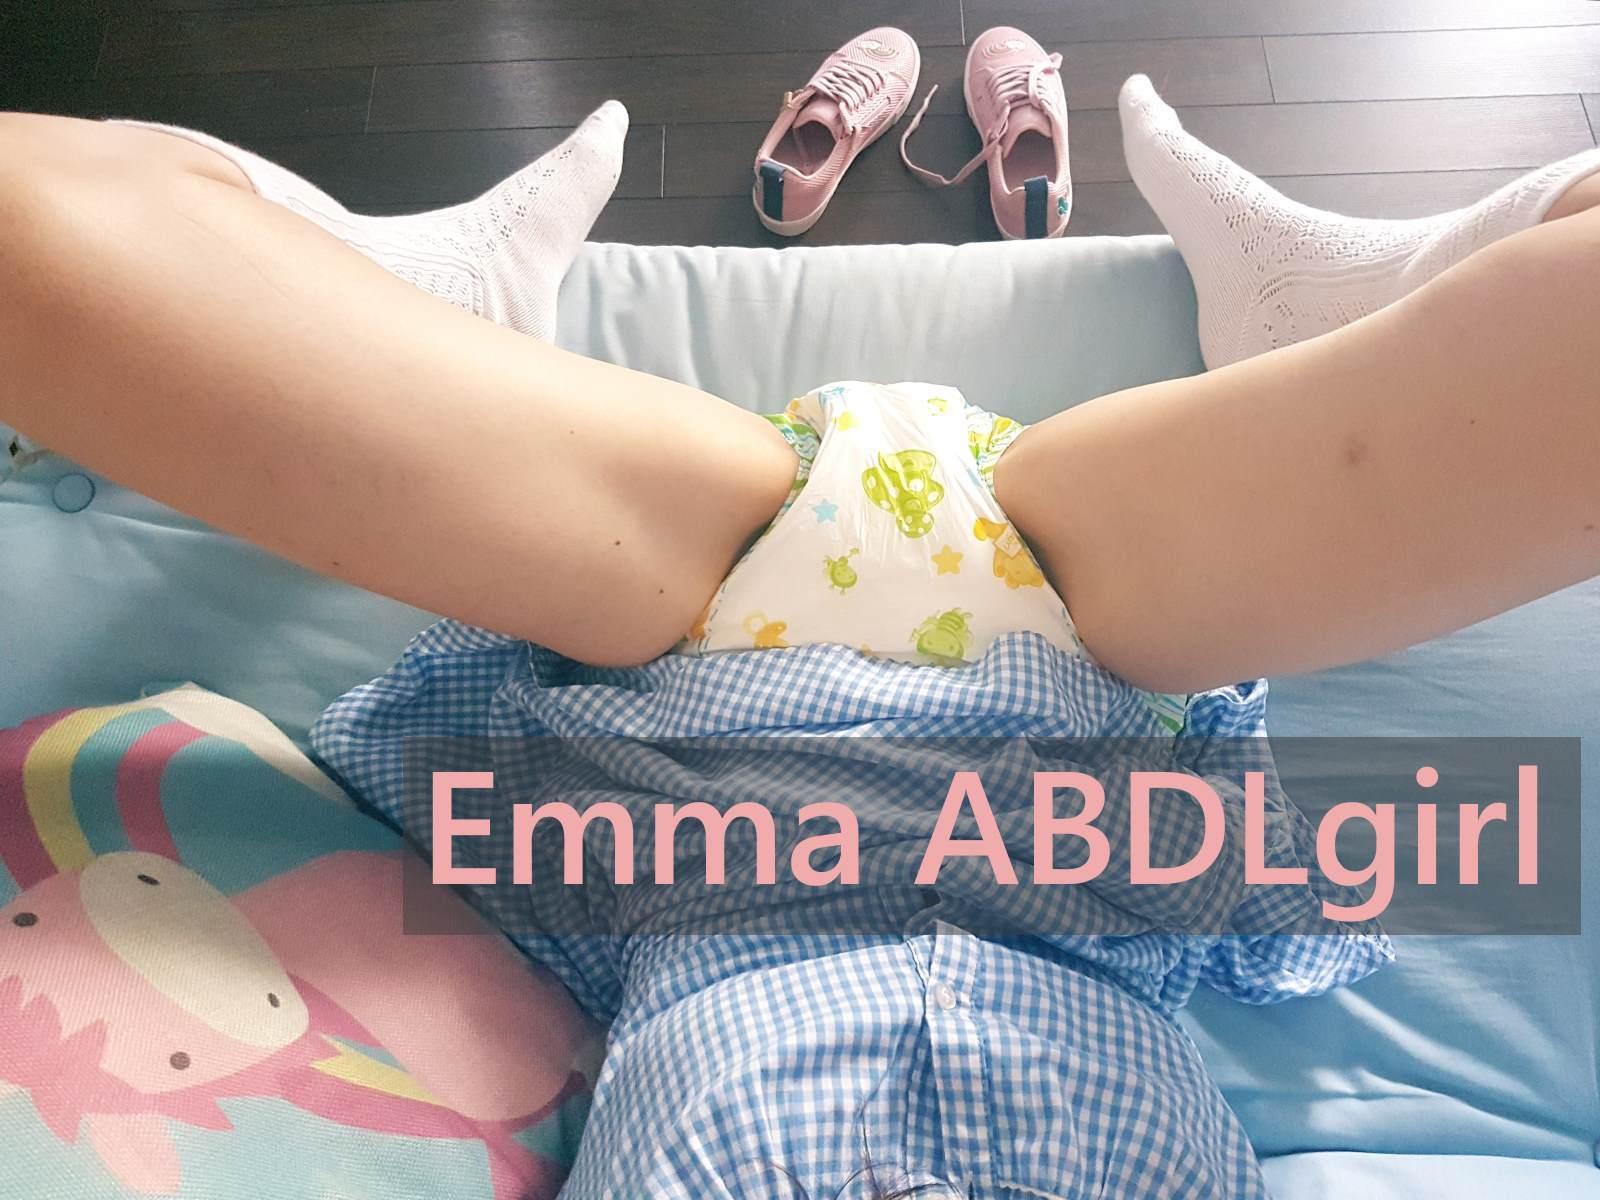 Enter Emma ABDLgirl's website